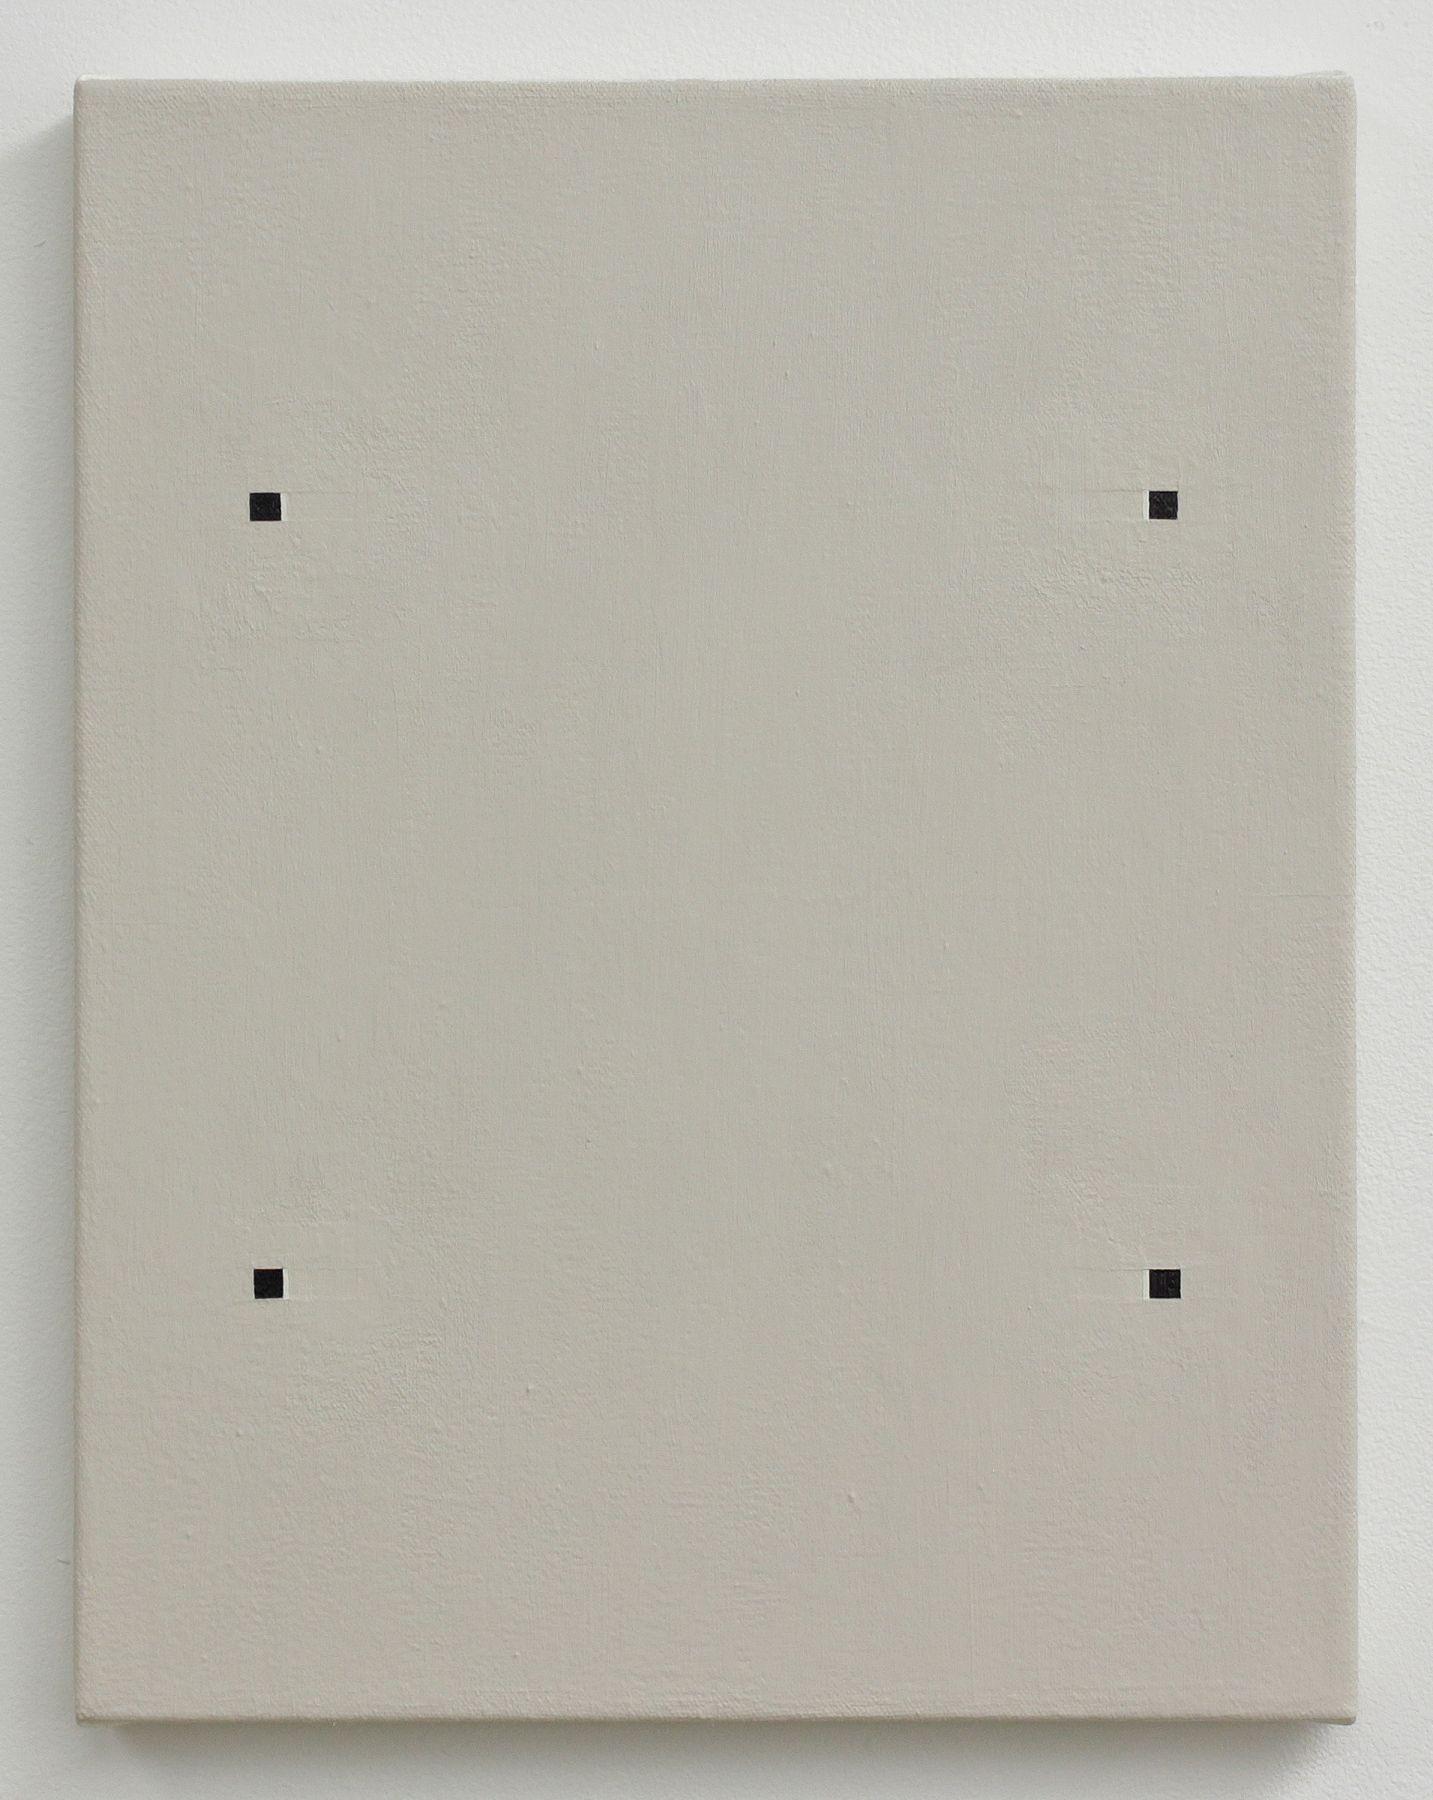 Matthew Feyld, Untitled, 2014-2015